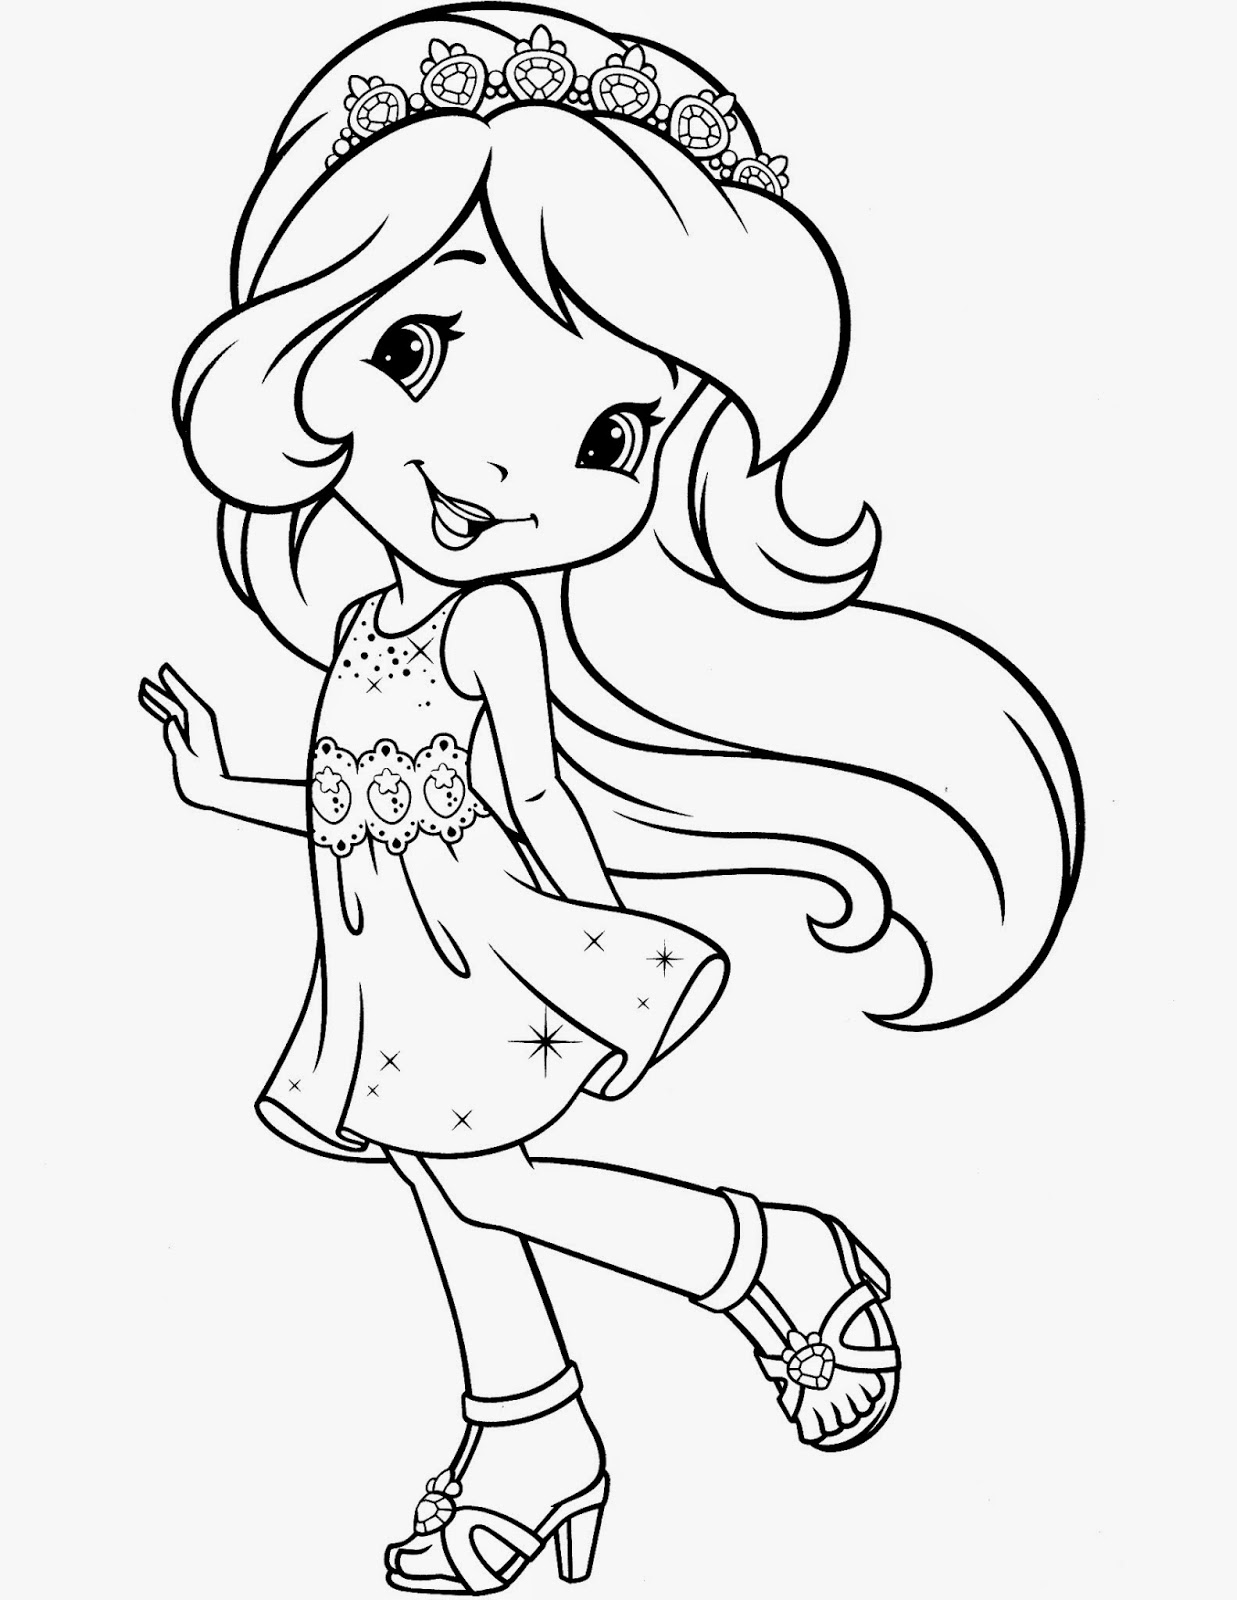 Desenhos Das Princesas Para Imprimir Colorir Pintar E Se Divertir